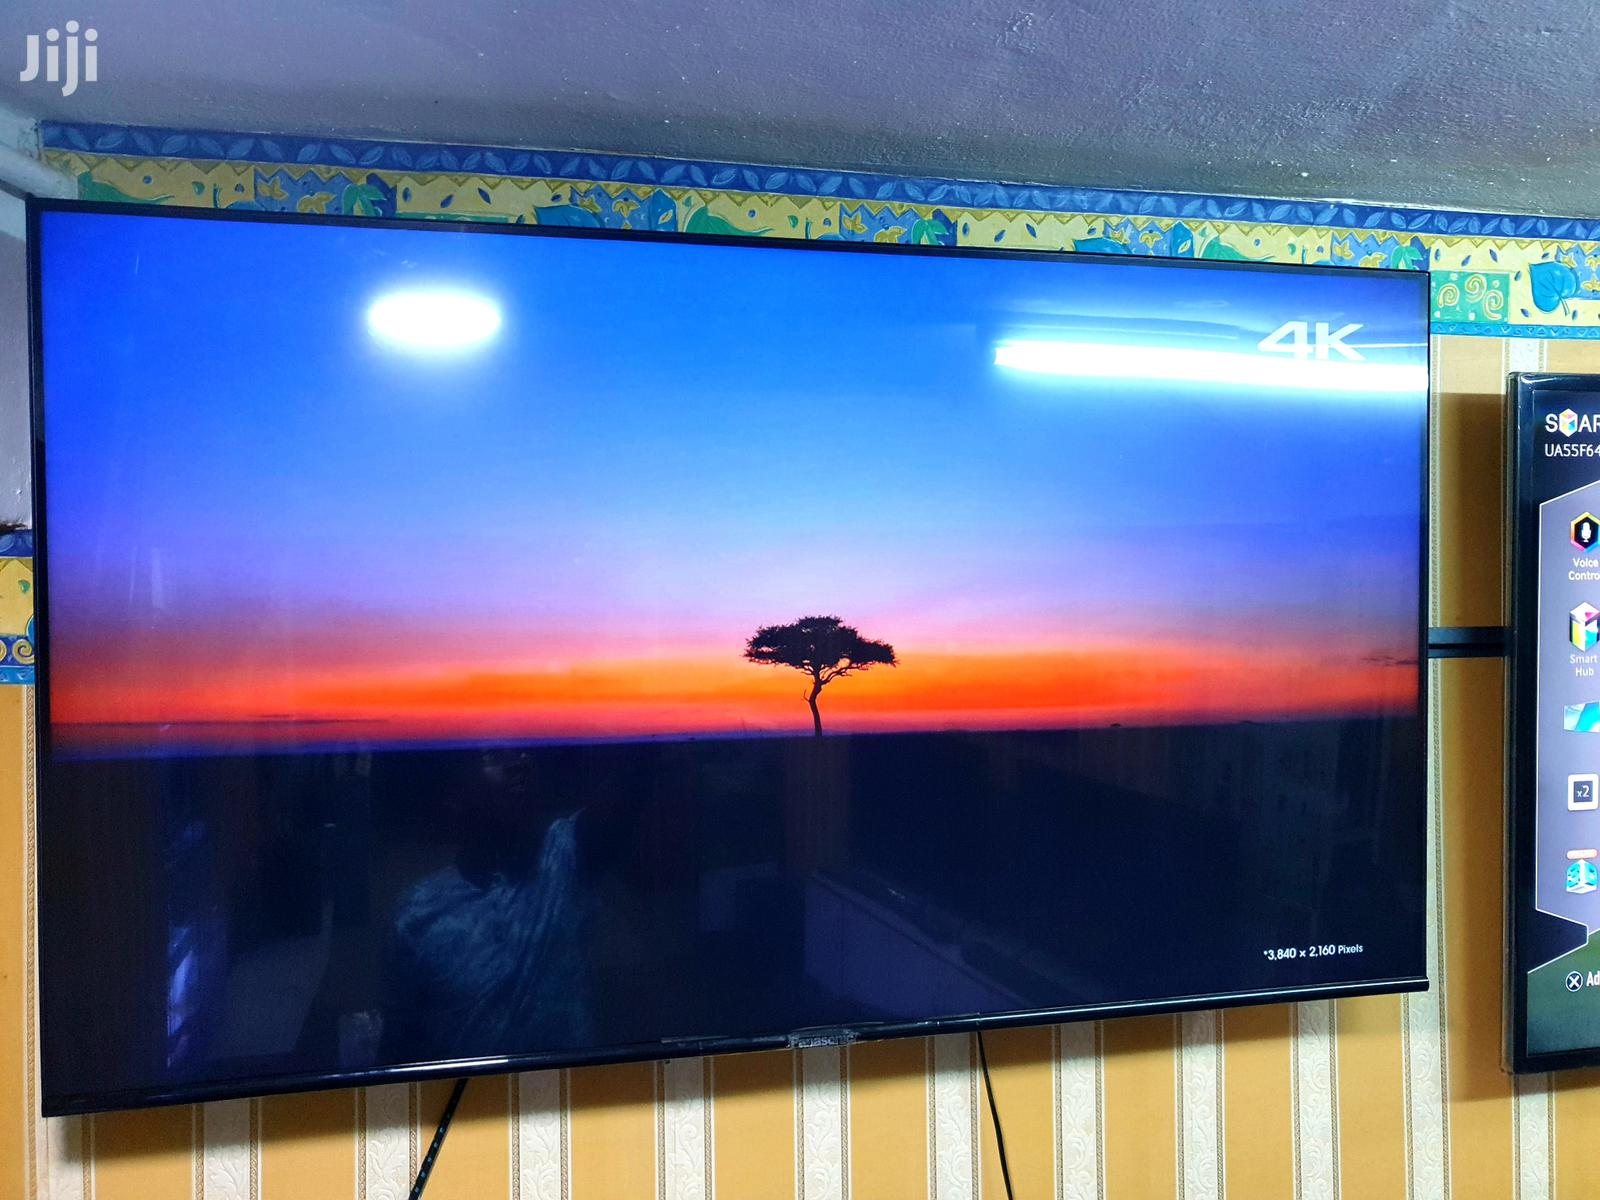 Panasonic 55inch Smart Ultra Hd 4k Tvs | TV & DVD Equipment for sale in Kampala, Central Region, Uganda